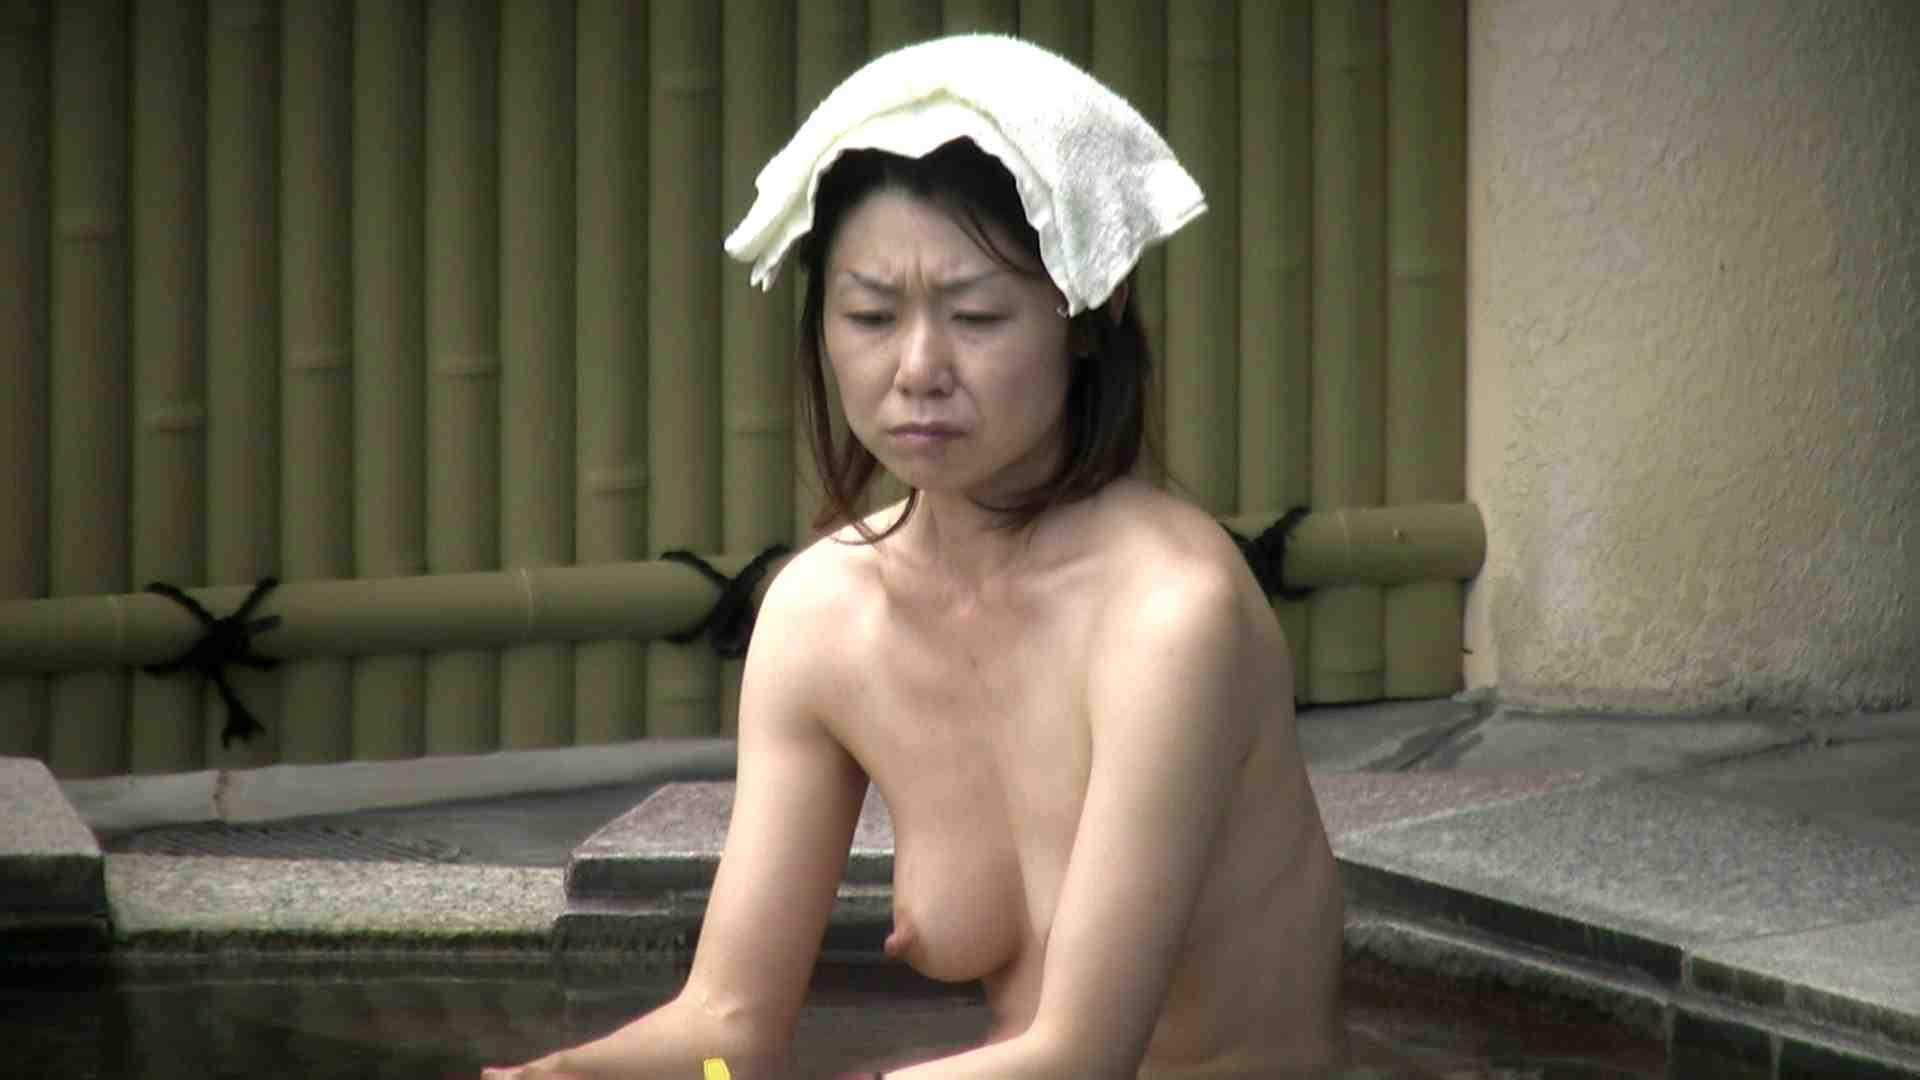 Aquaな露天風呂Vol.658 盗撮 おまんこ無修正動画無料 30連発 14